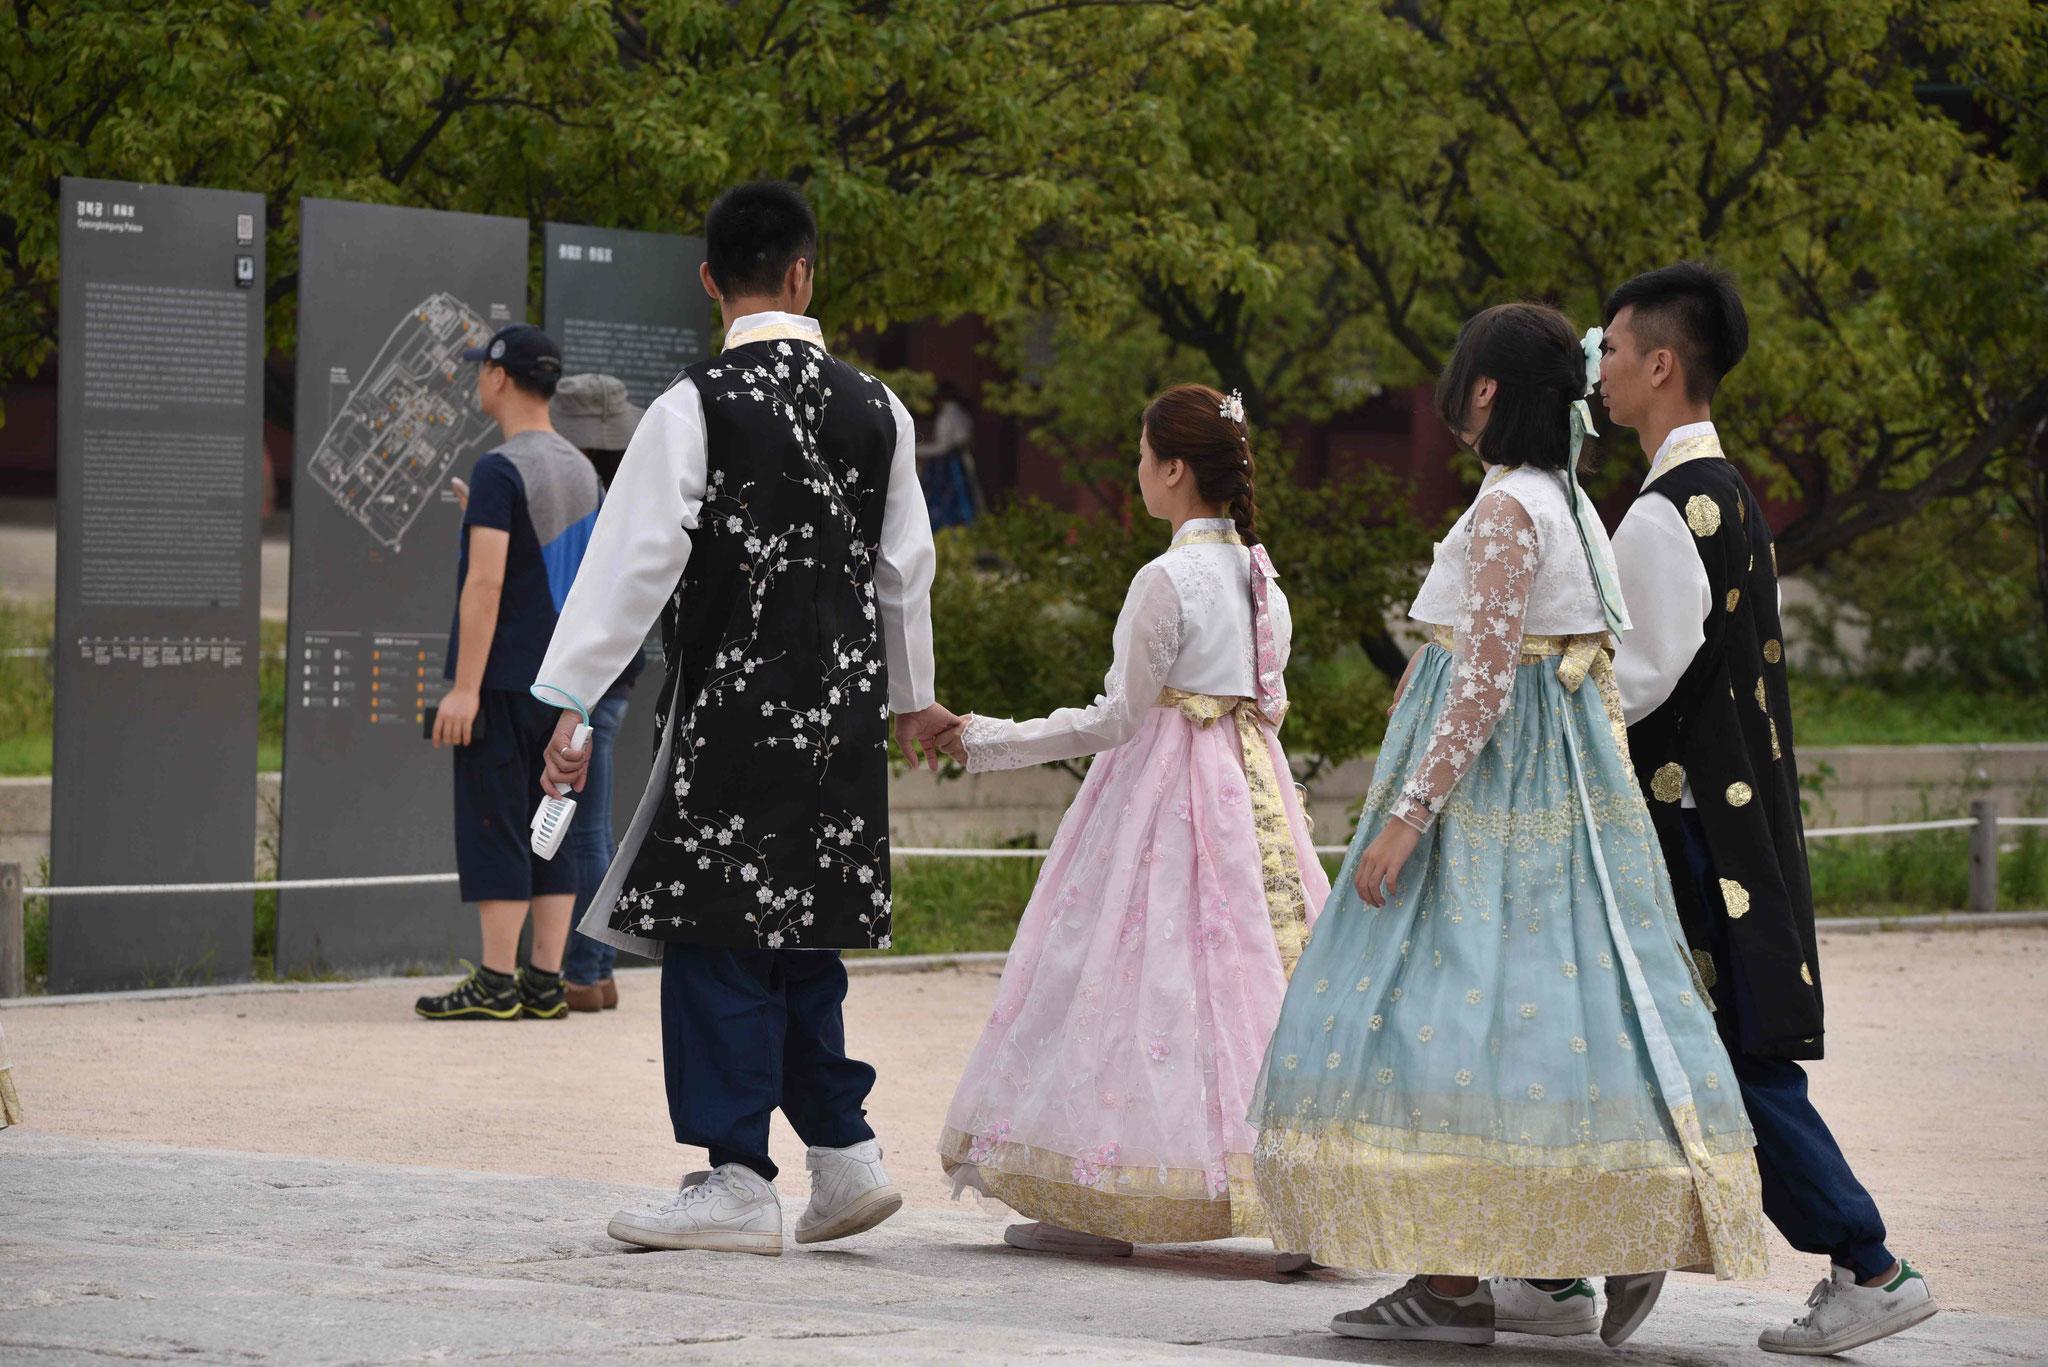 Junge Paare pflegen die Tradition voller Stolz